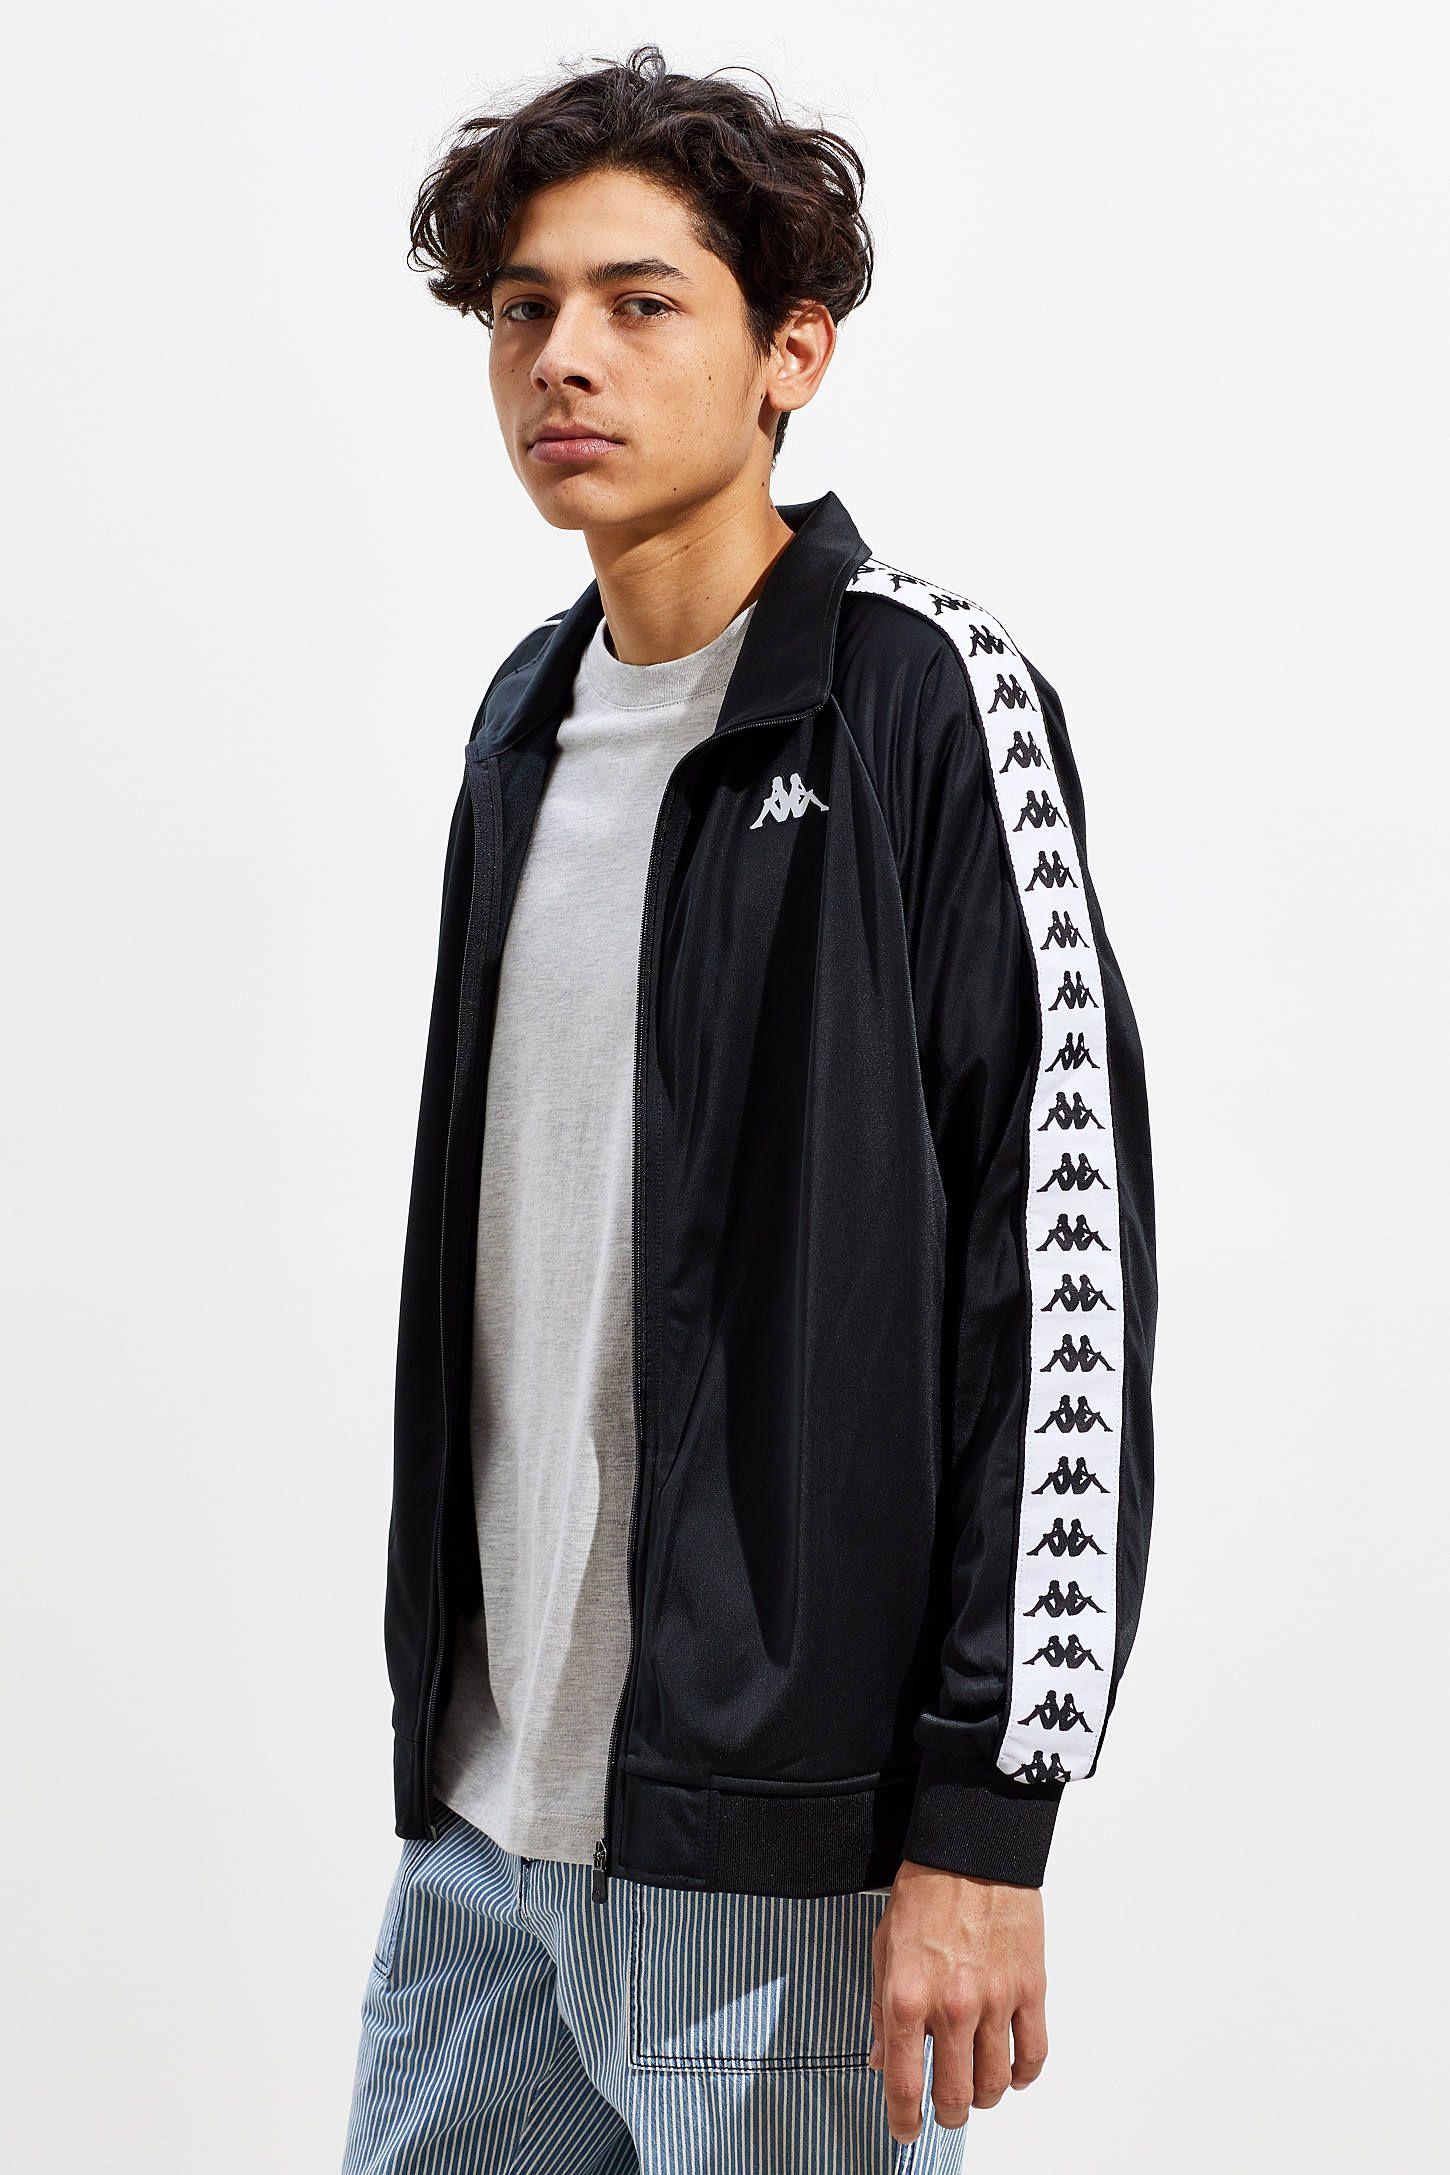 Kappa Banda Anniston Track Jacket Stylish Mens Coats Track Jackets Jackets [ 2175 x 1450 Pixel ]